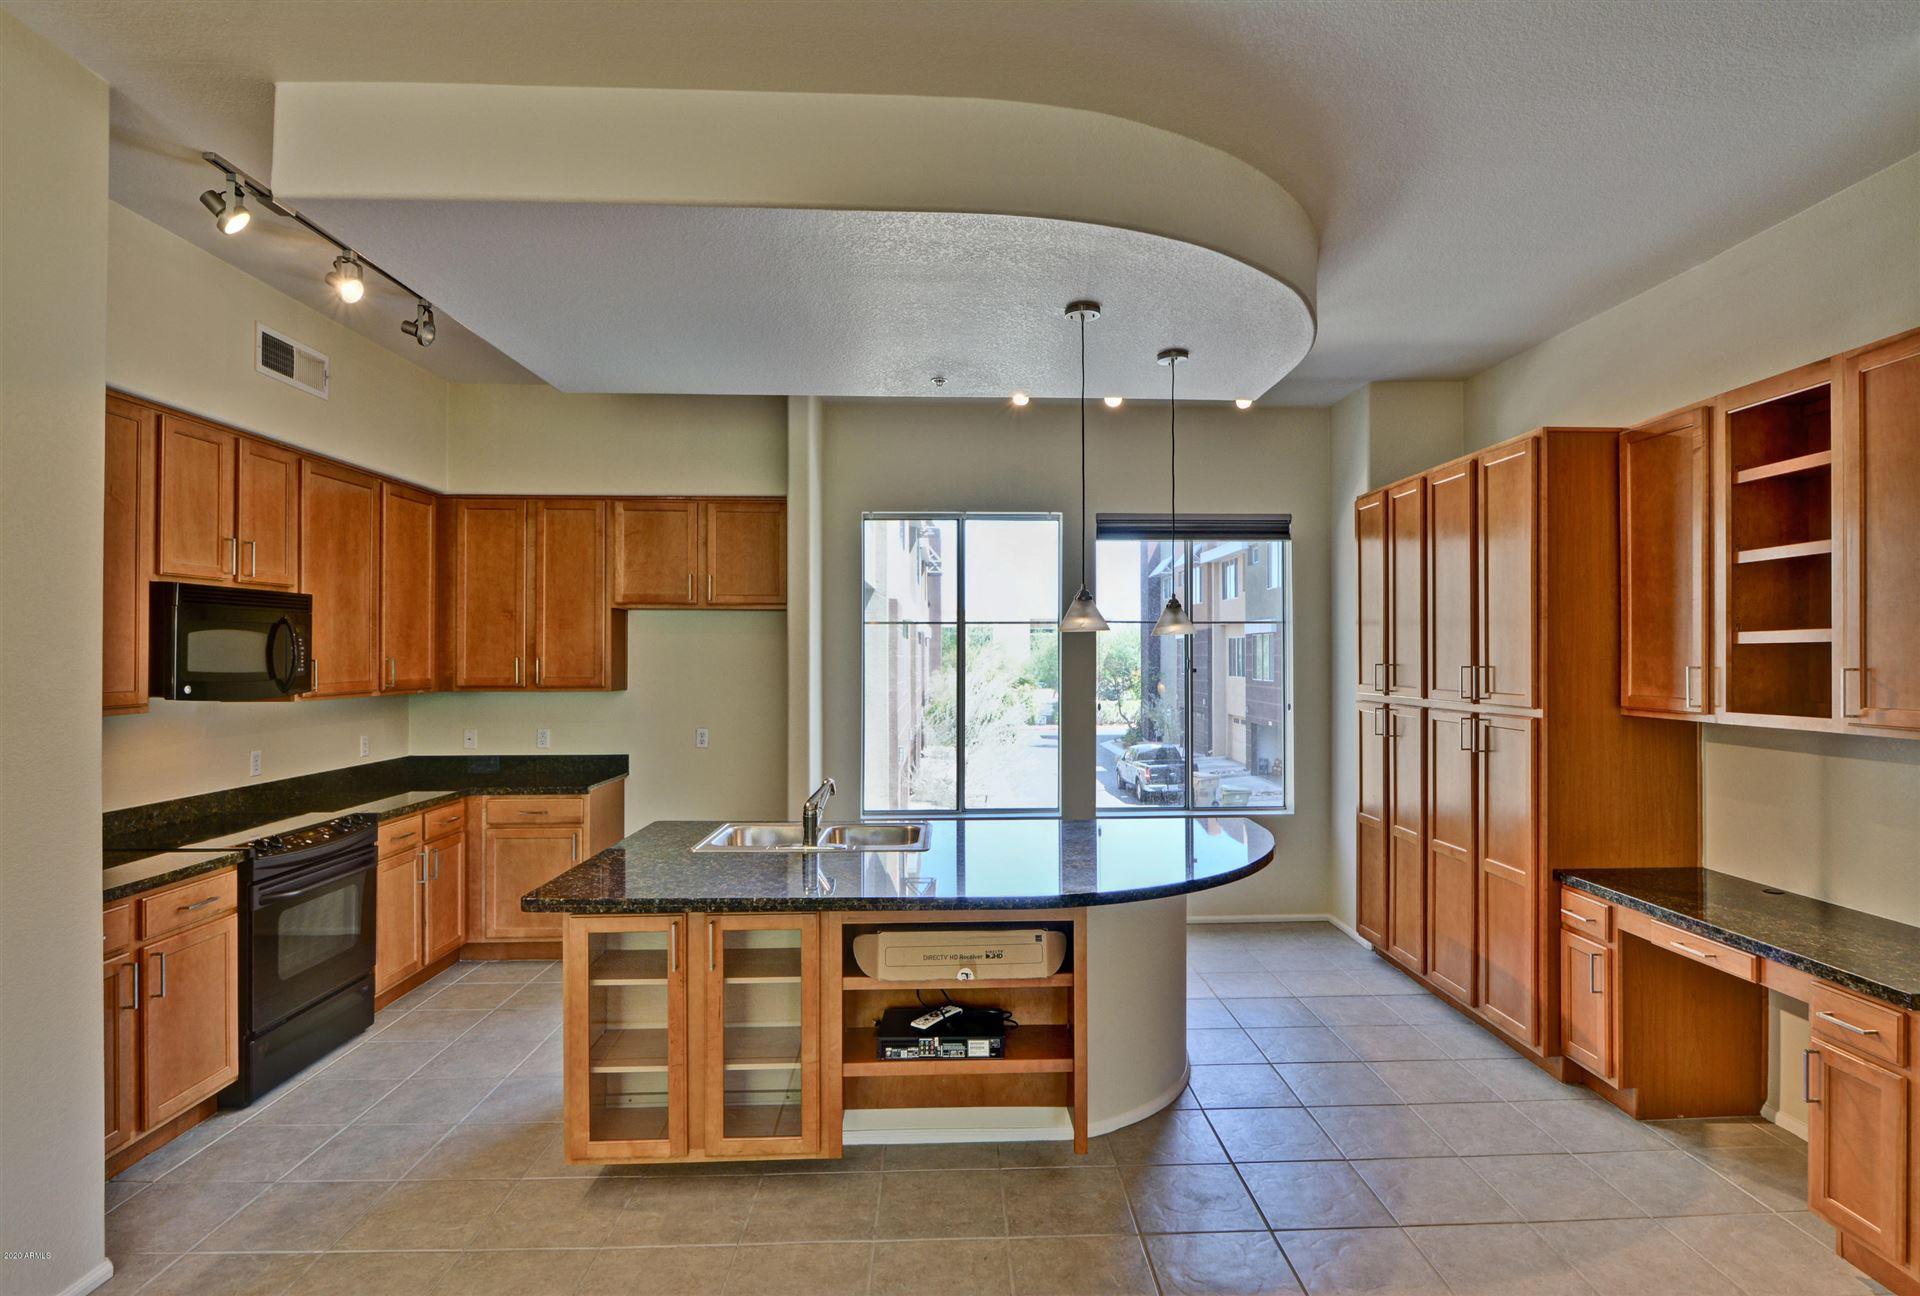 6605 N 93RD Avenue #1082, Glendale, AZ 85305 - MLS#: 6127176